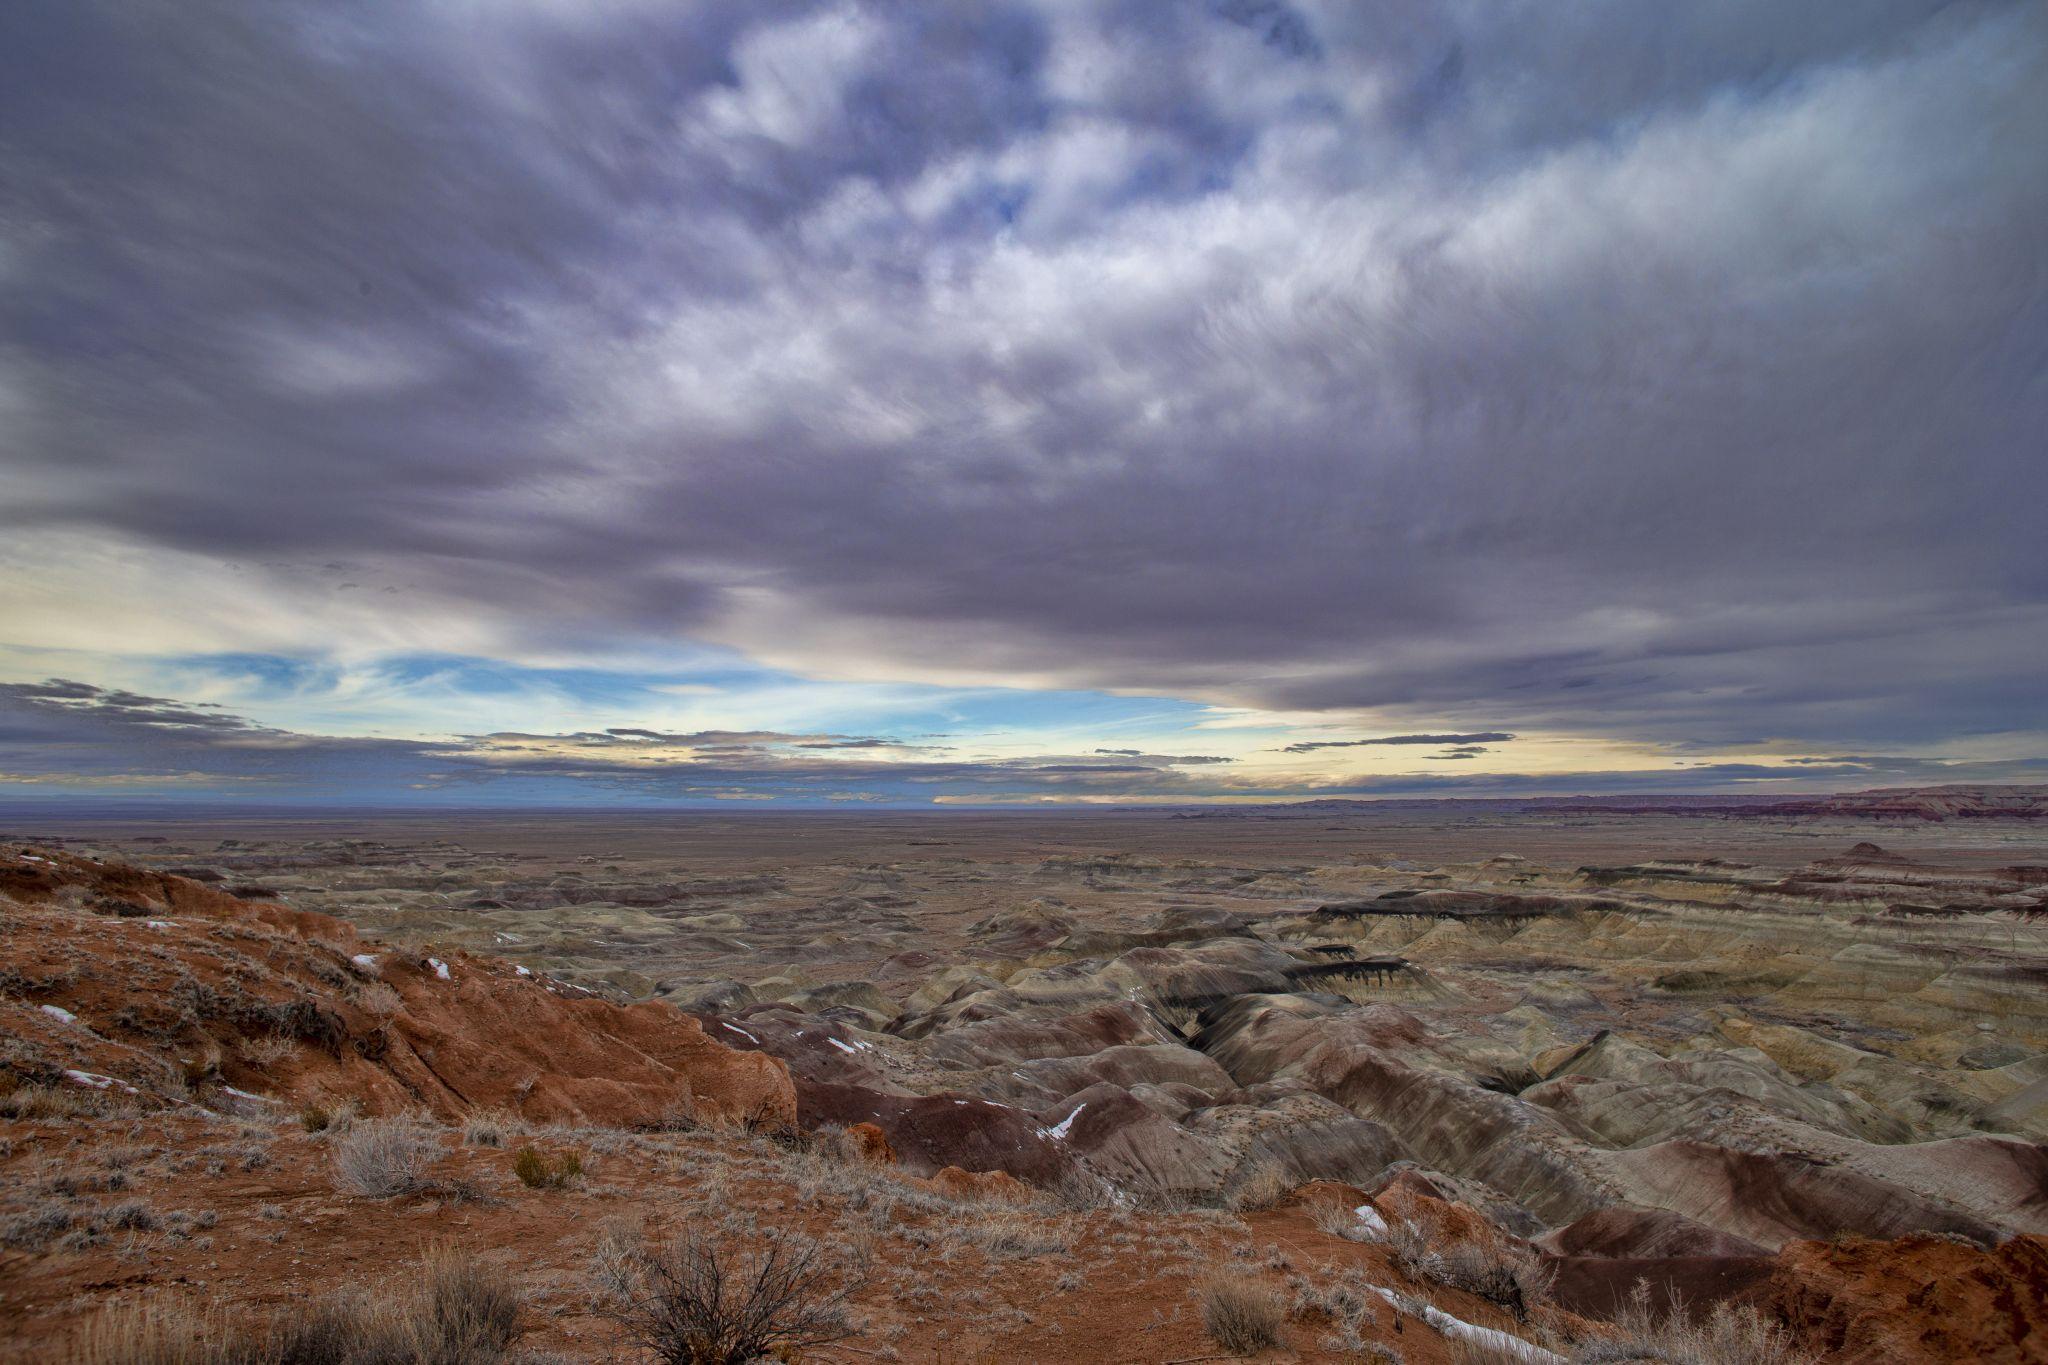 Little Painted Desert, USA